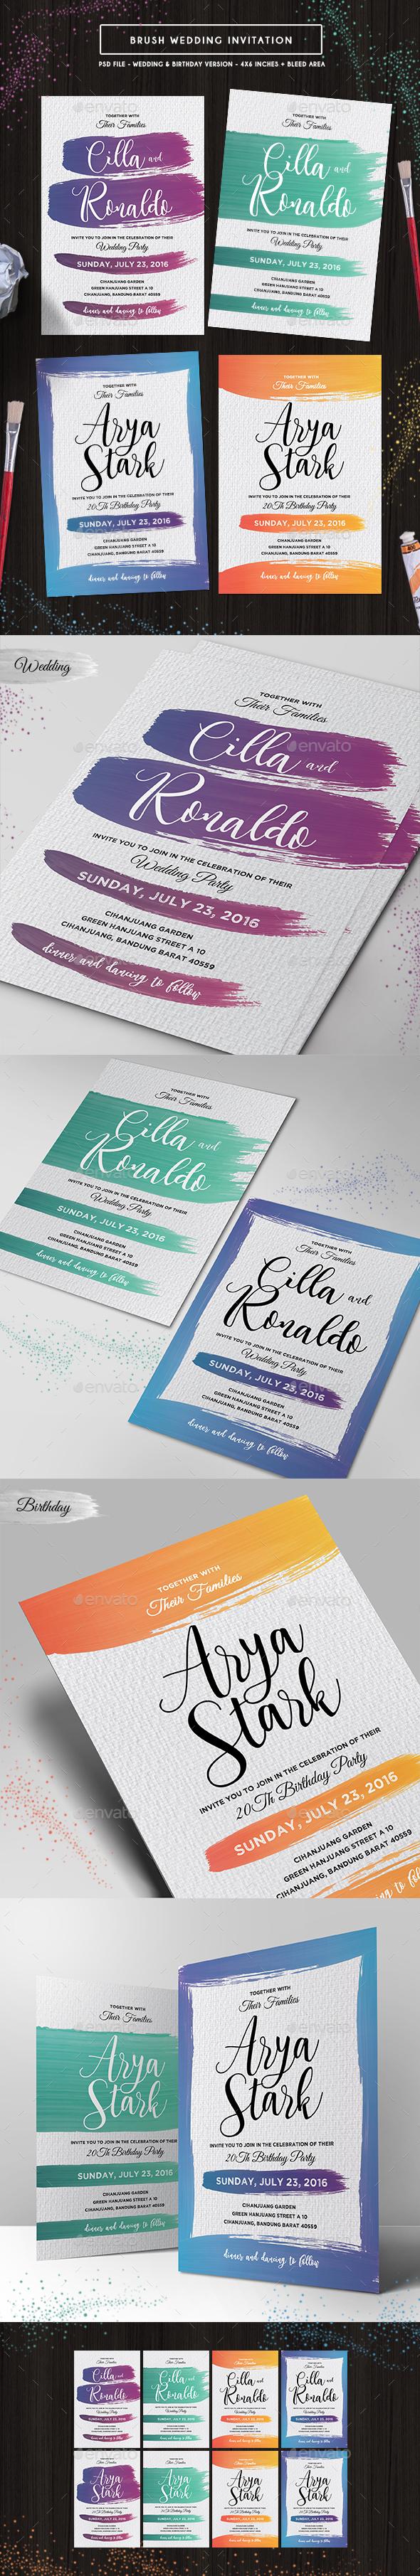 Brush Wedding Invitation - Invitations Cards & Invites